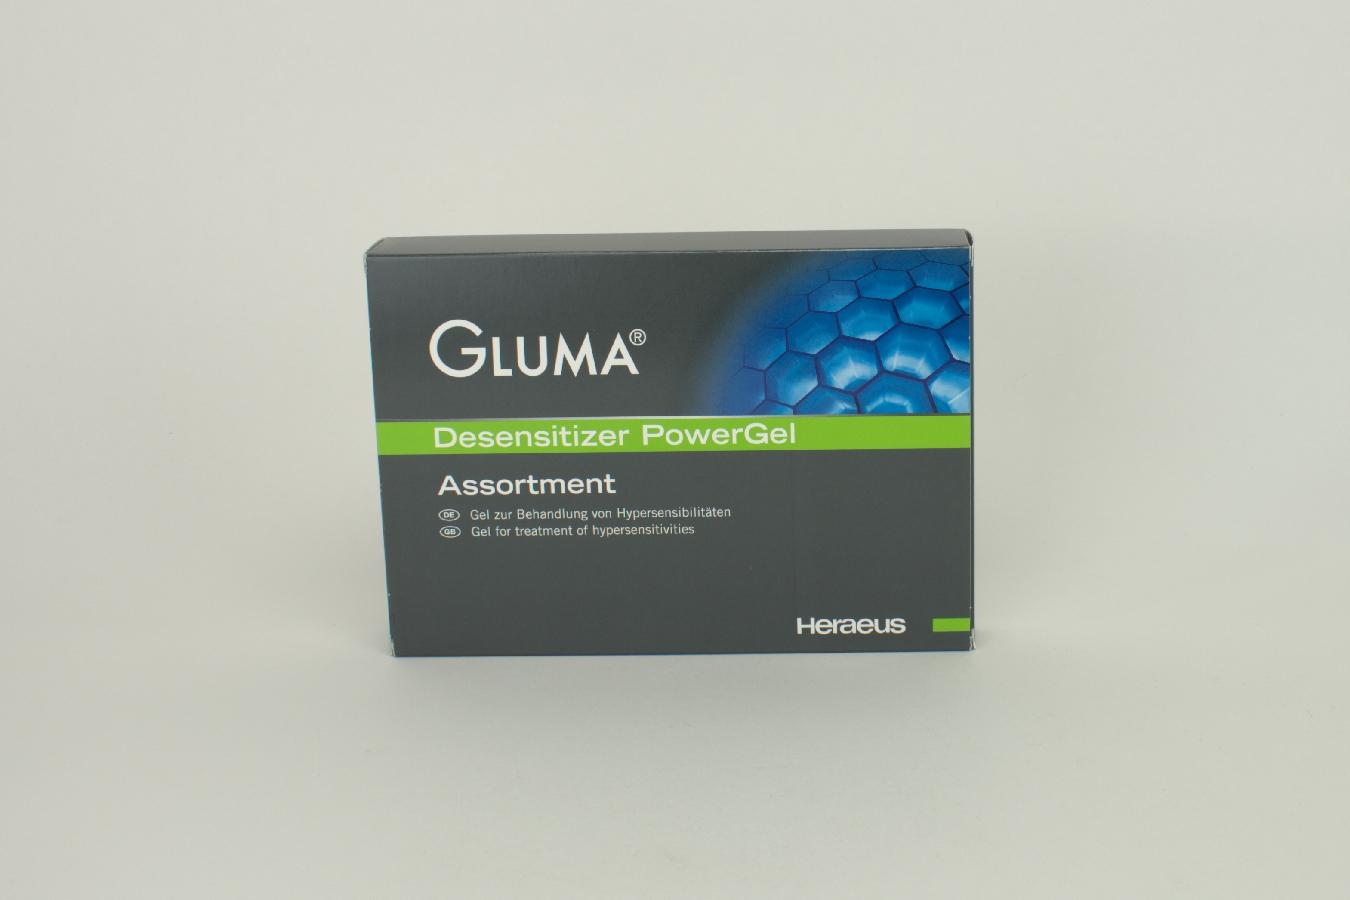 Gluma Desensitizer Powergel 4x1ml Assort